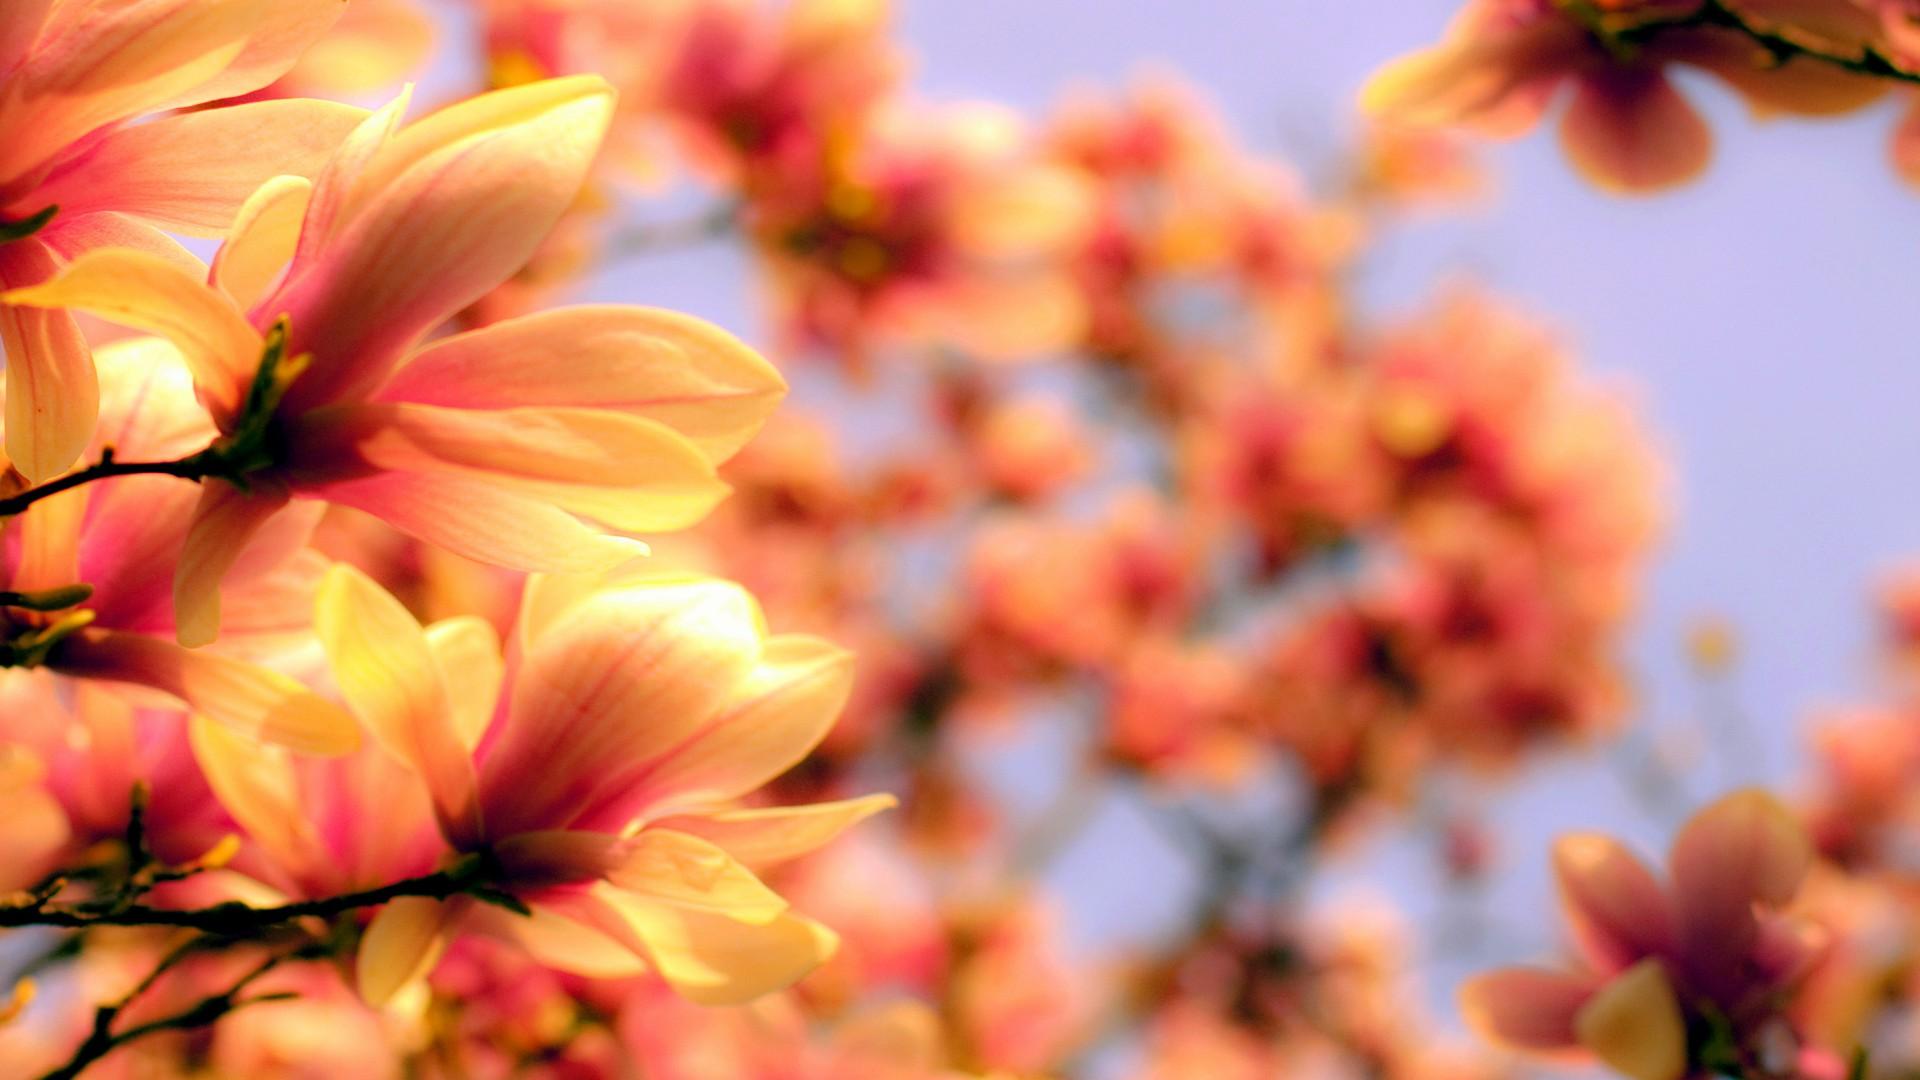 Wallpaper Magnolia 4k Hd Wallpaper Asia Spring Flower Nature 3790